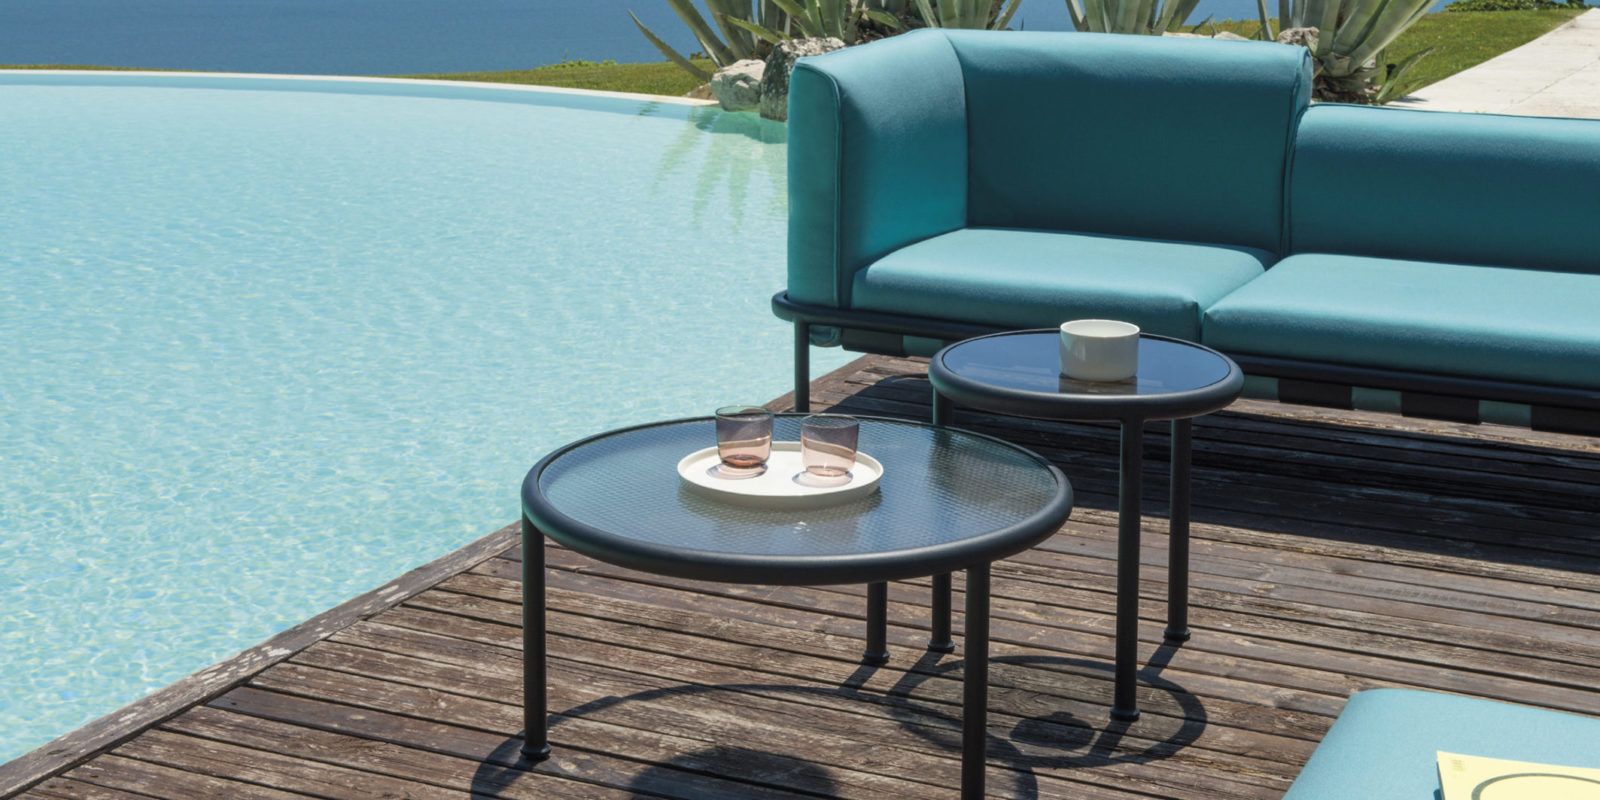 Salon de jardin dock emu buxus mobilier outdoor for Emu salon jardin